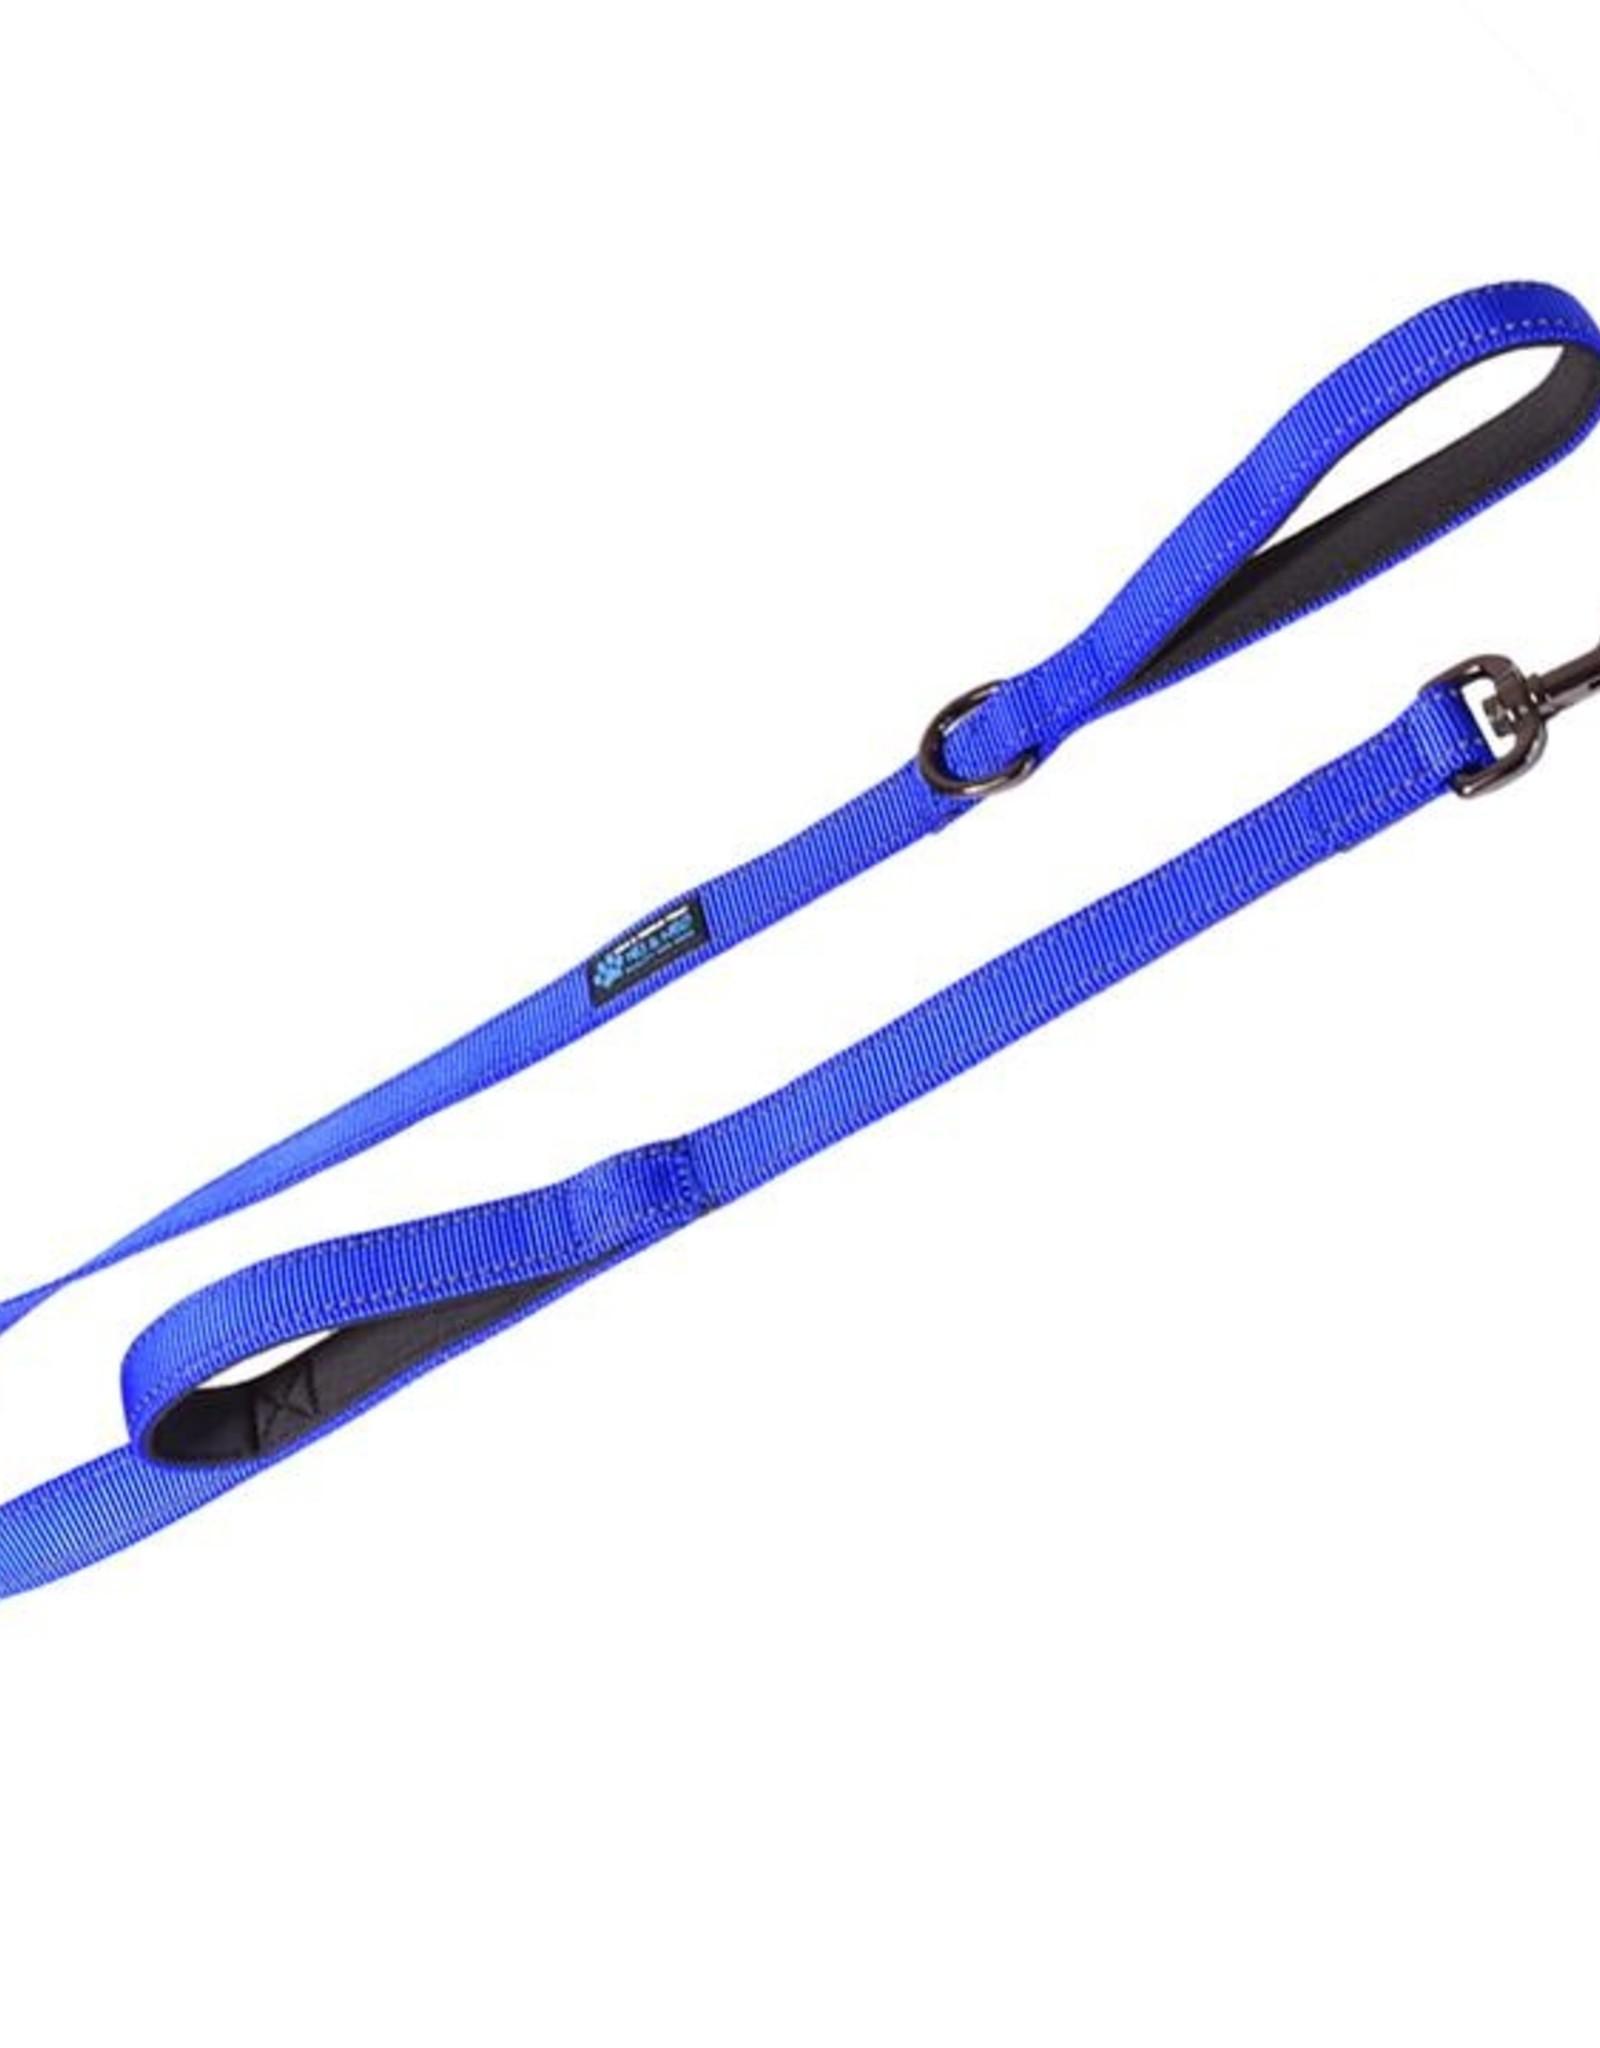 Max & Neo Double Handle Leash - Blue 4ft